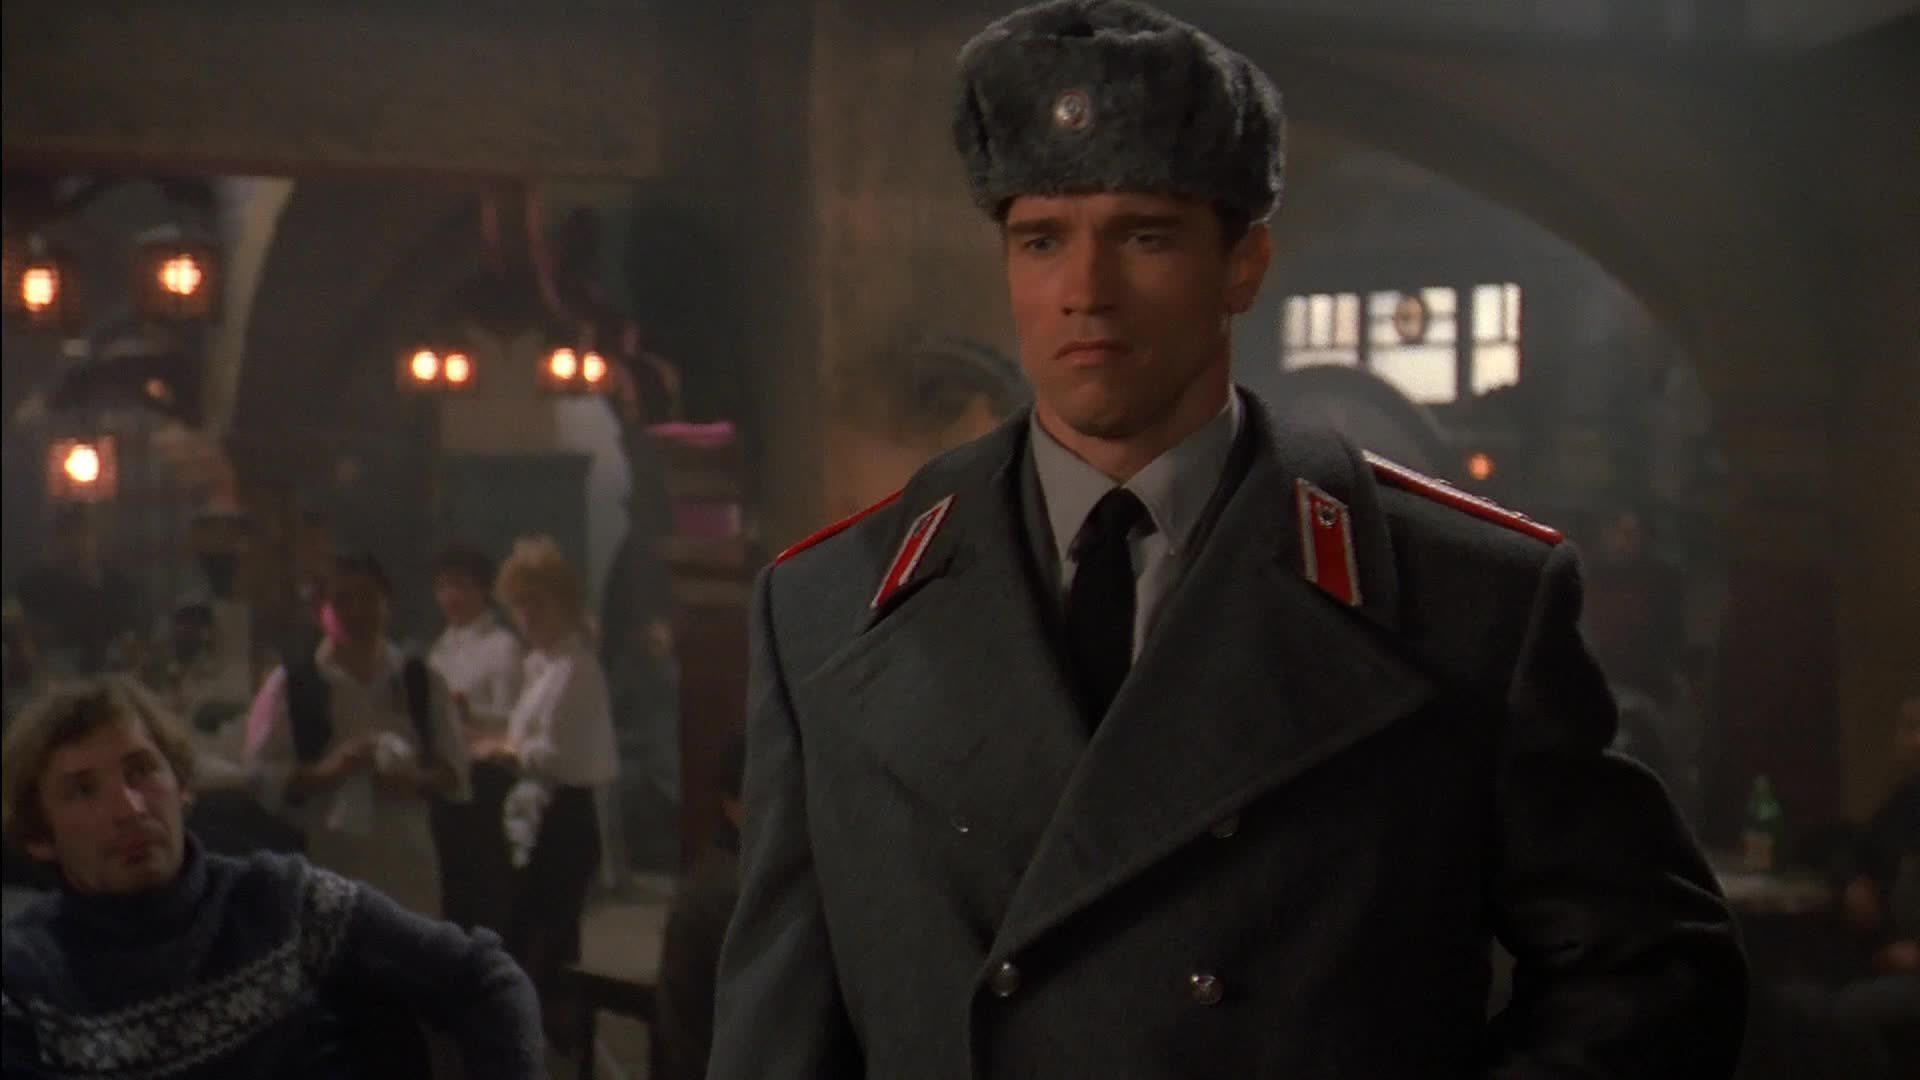 Arnold Schwarzenegger, fullcommunism, shitamericanssay, A Valentine for you, Comrade (reddit) GIFs